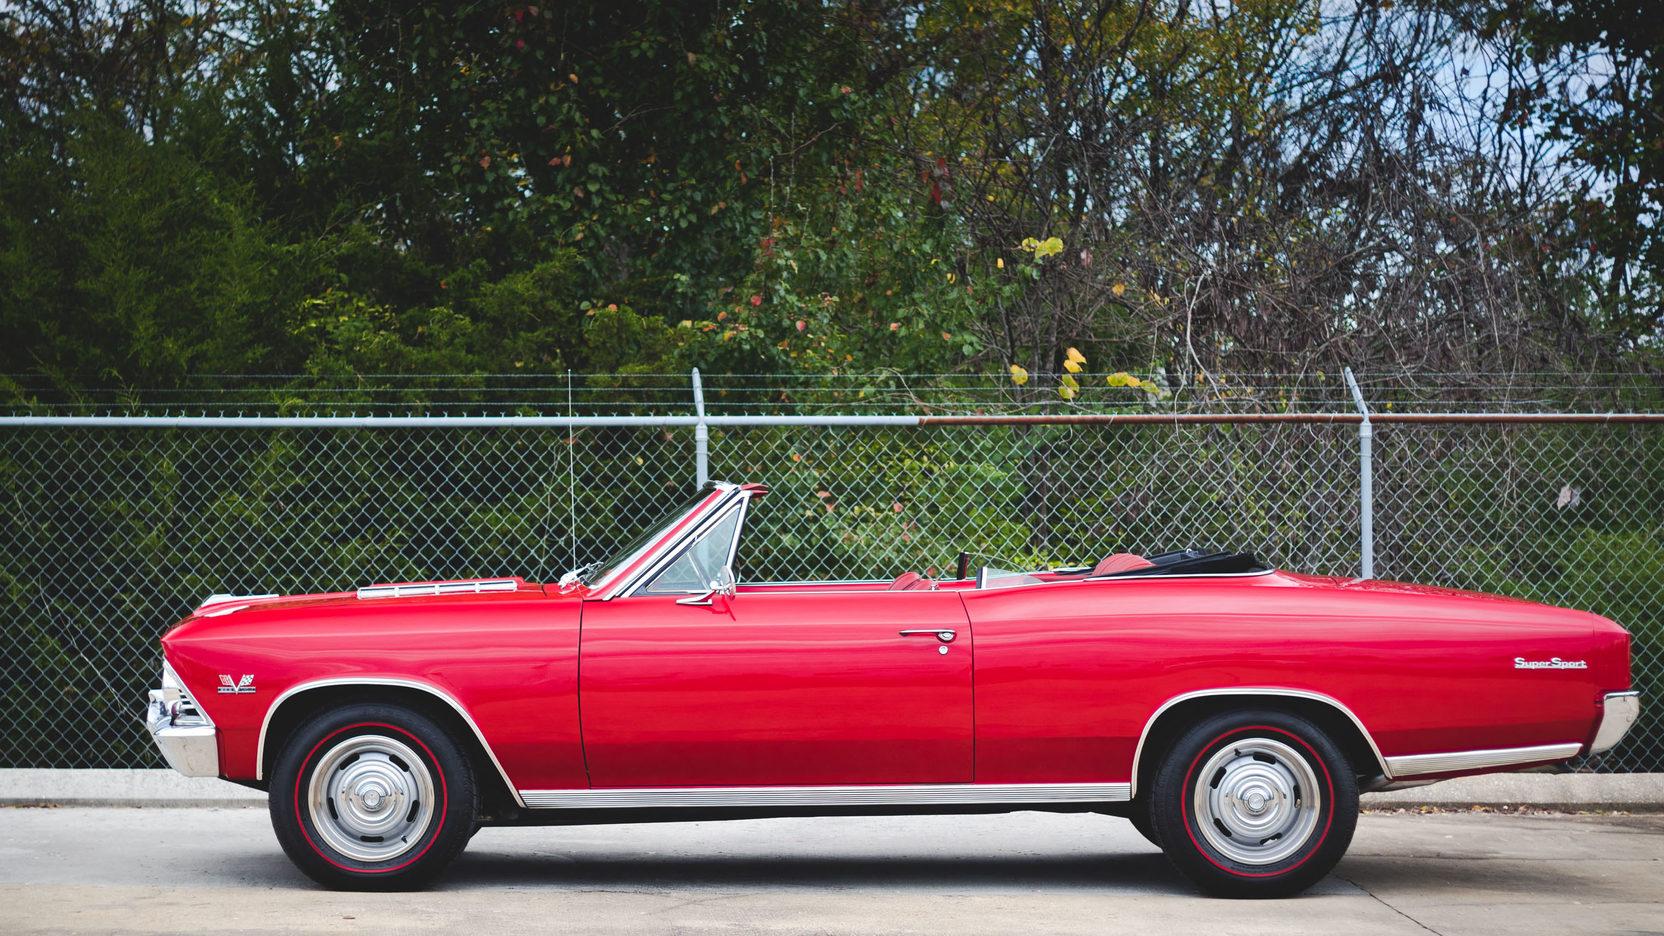 Convertible Chevelle Ss 1966